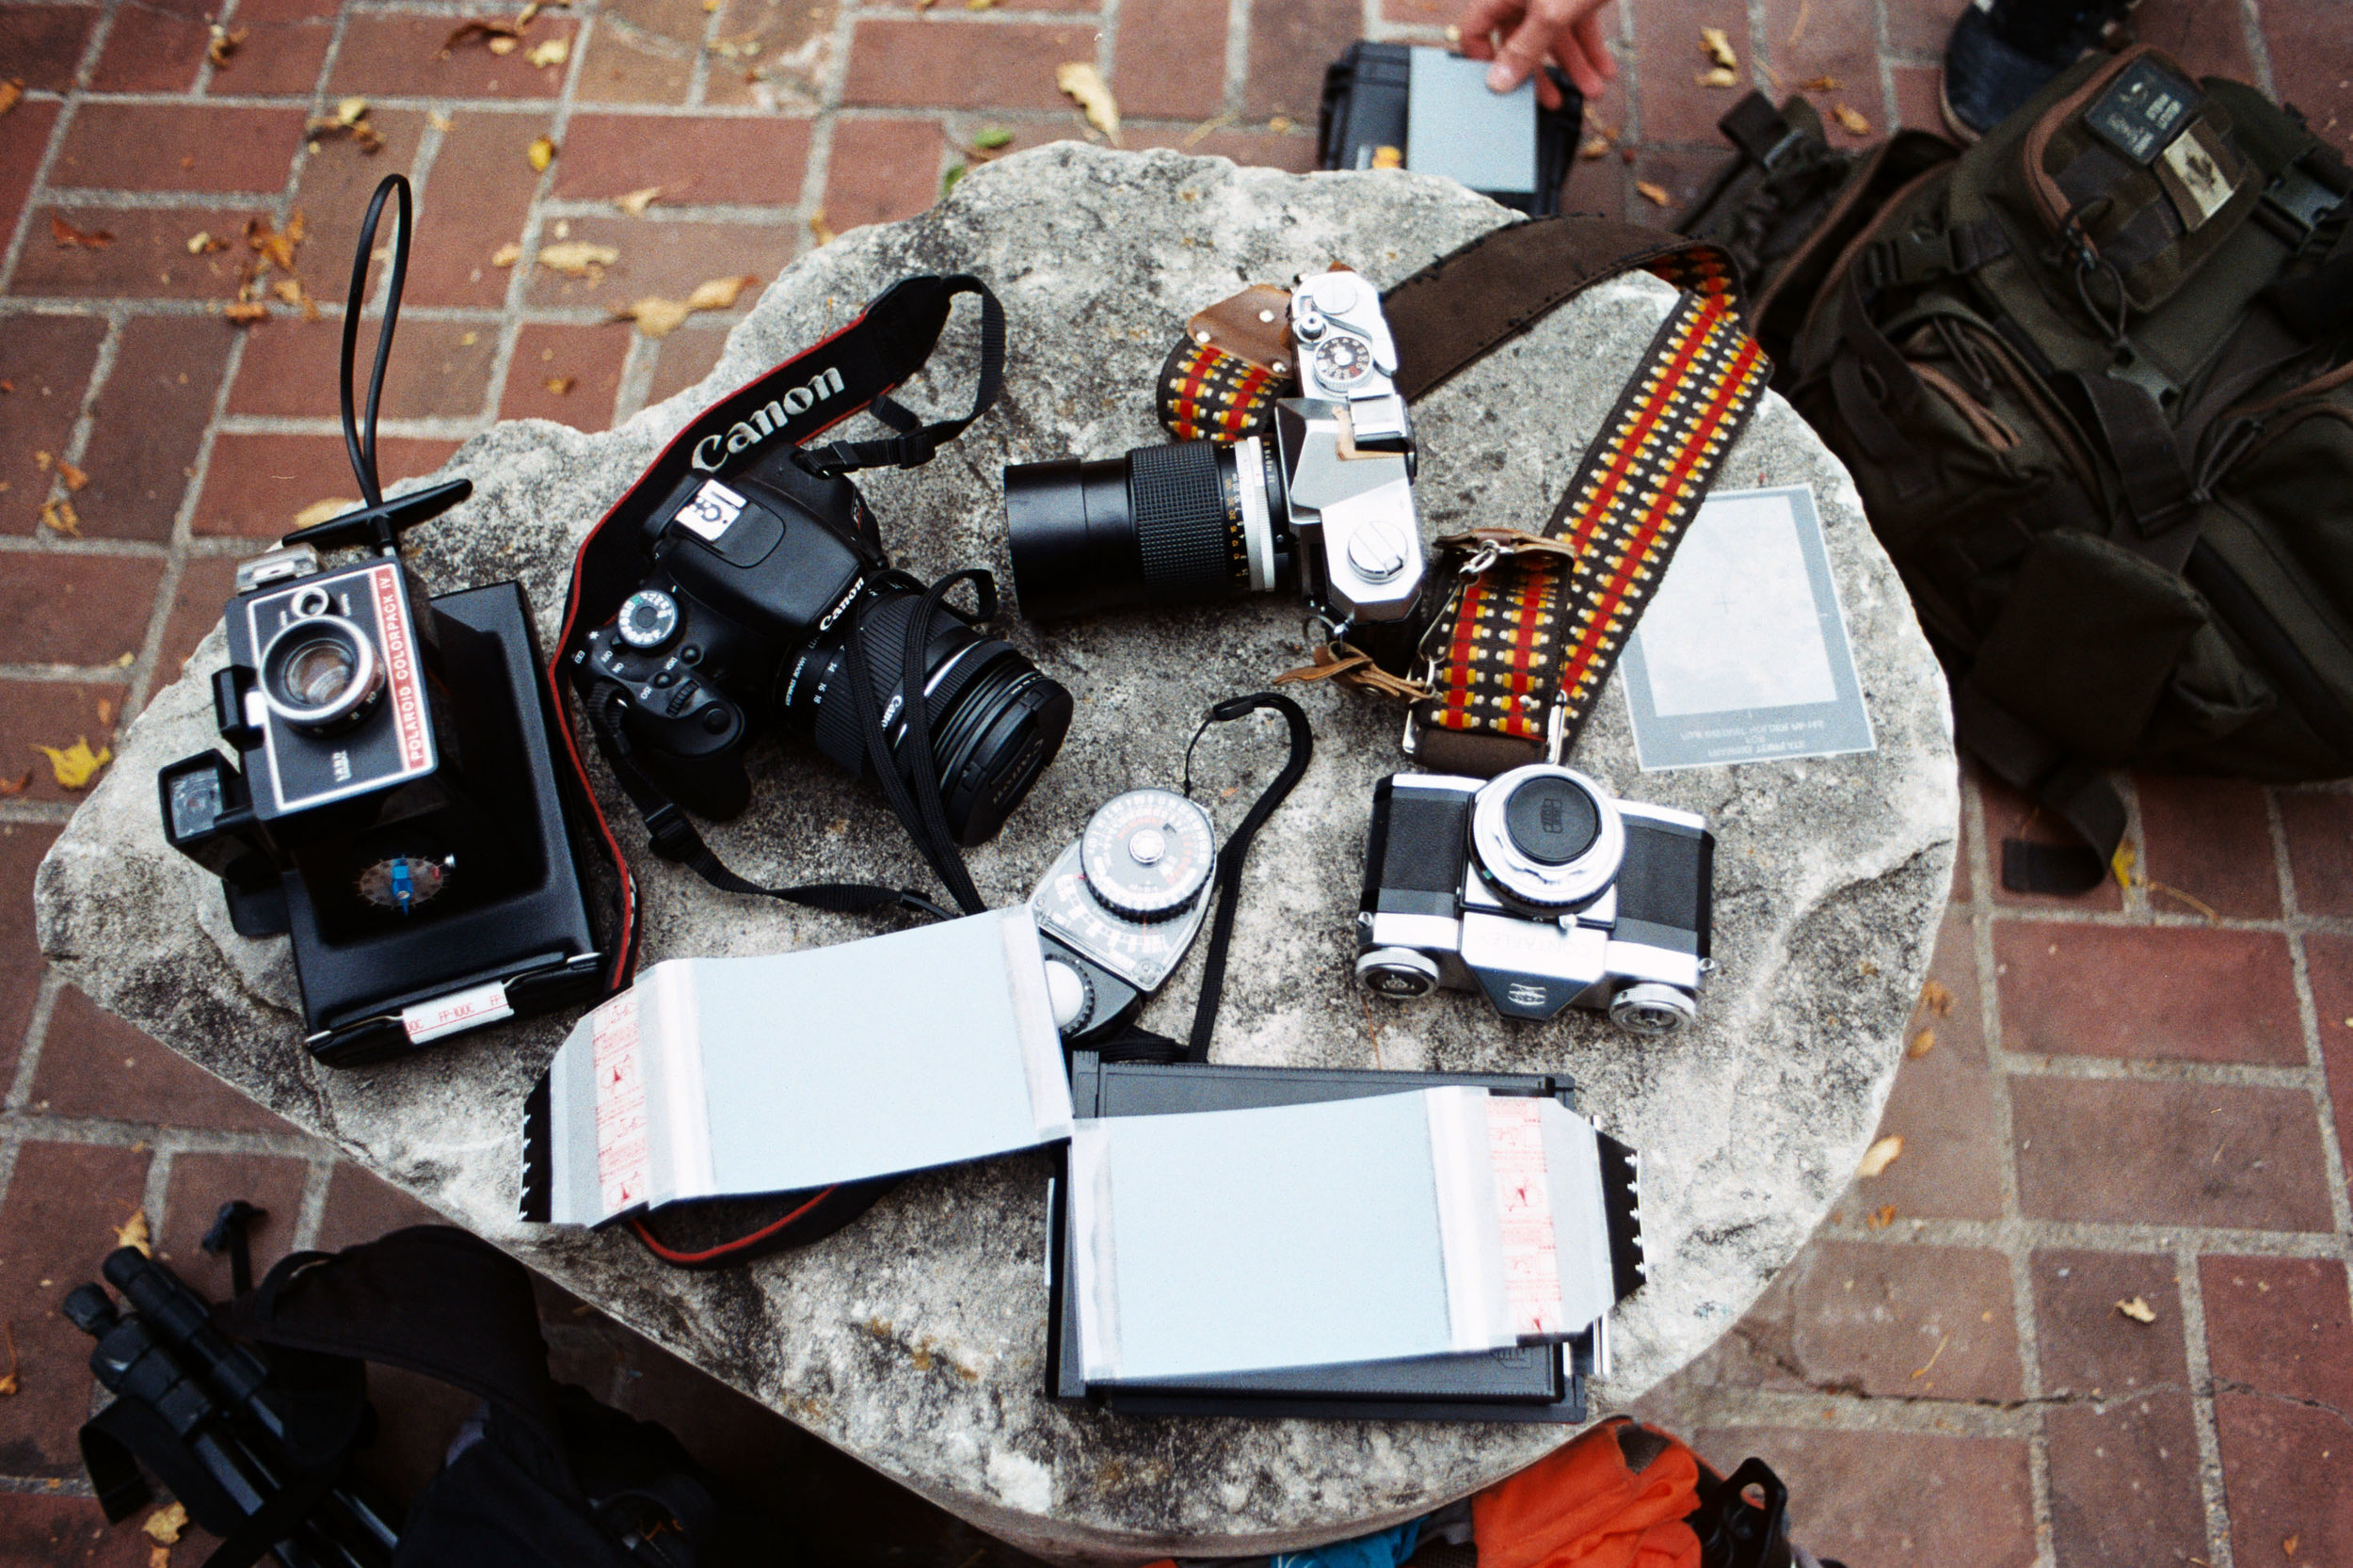 A small pile of cameras   September 2016